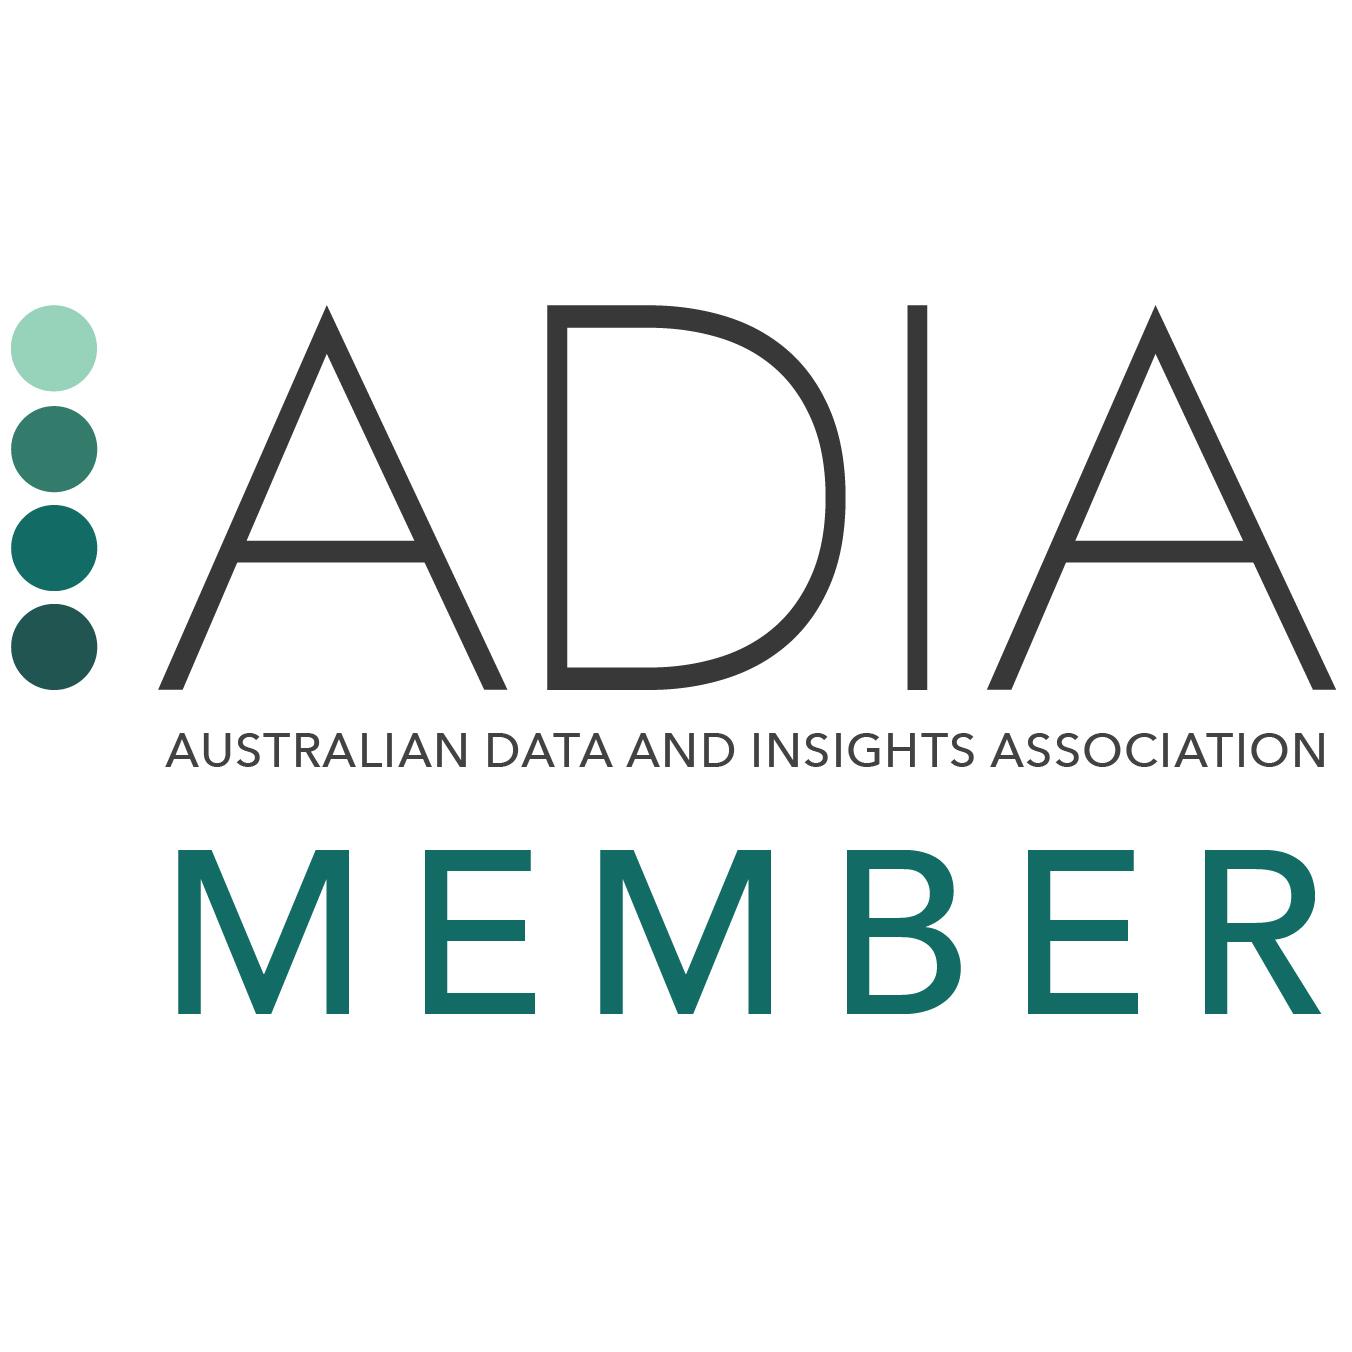 Australian Data and Insights Association